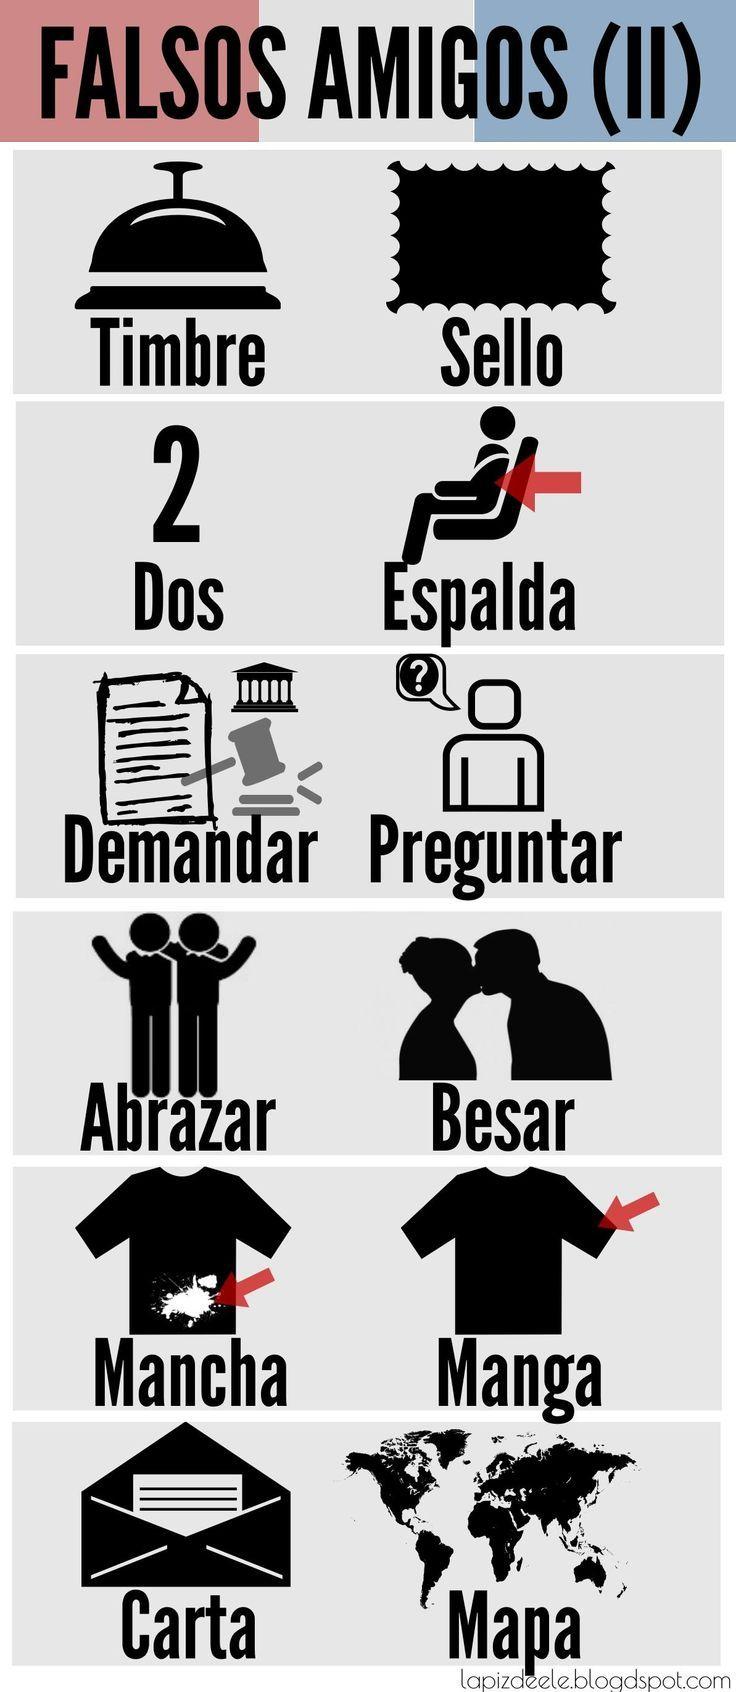 FRANCÉS/ESPAÑOL. Varios falsos amigos. lapizdeele.blogspot.com